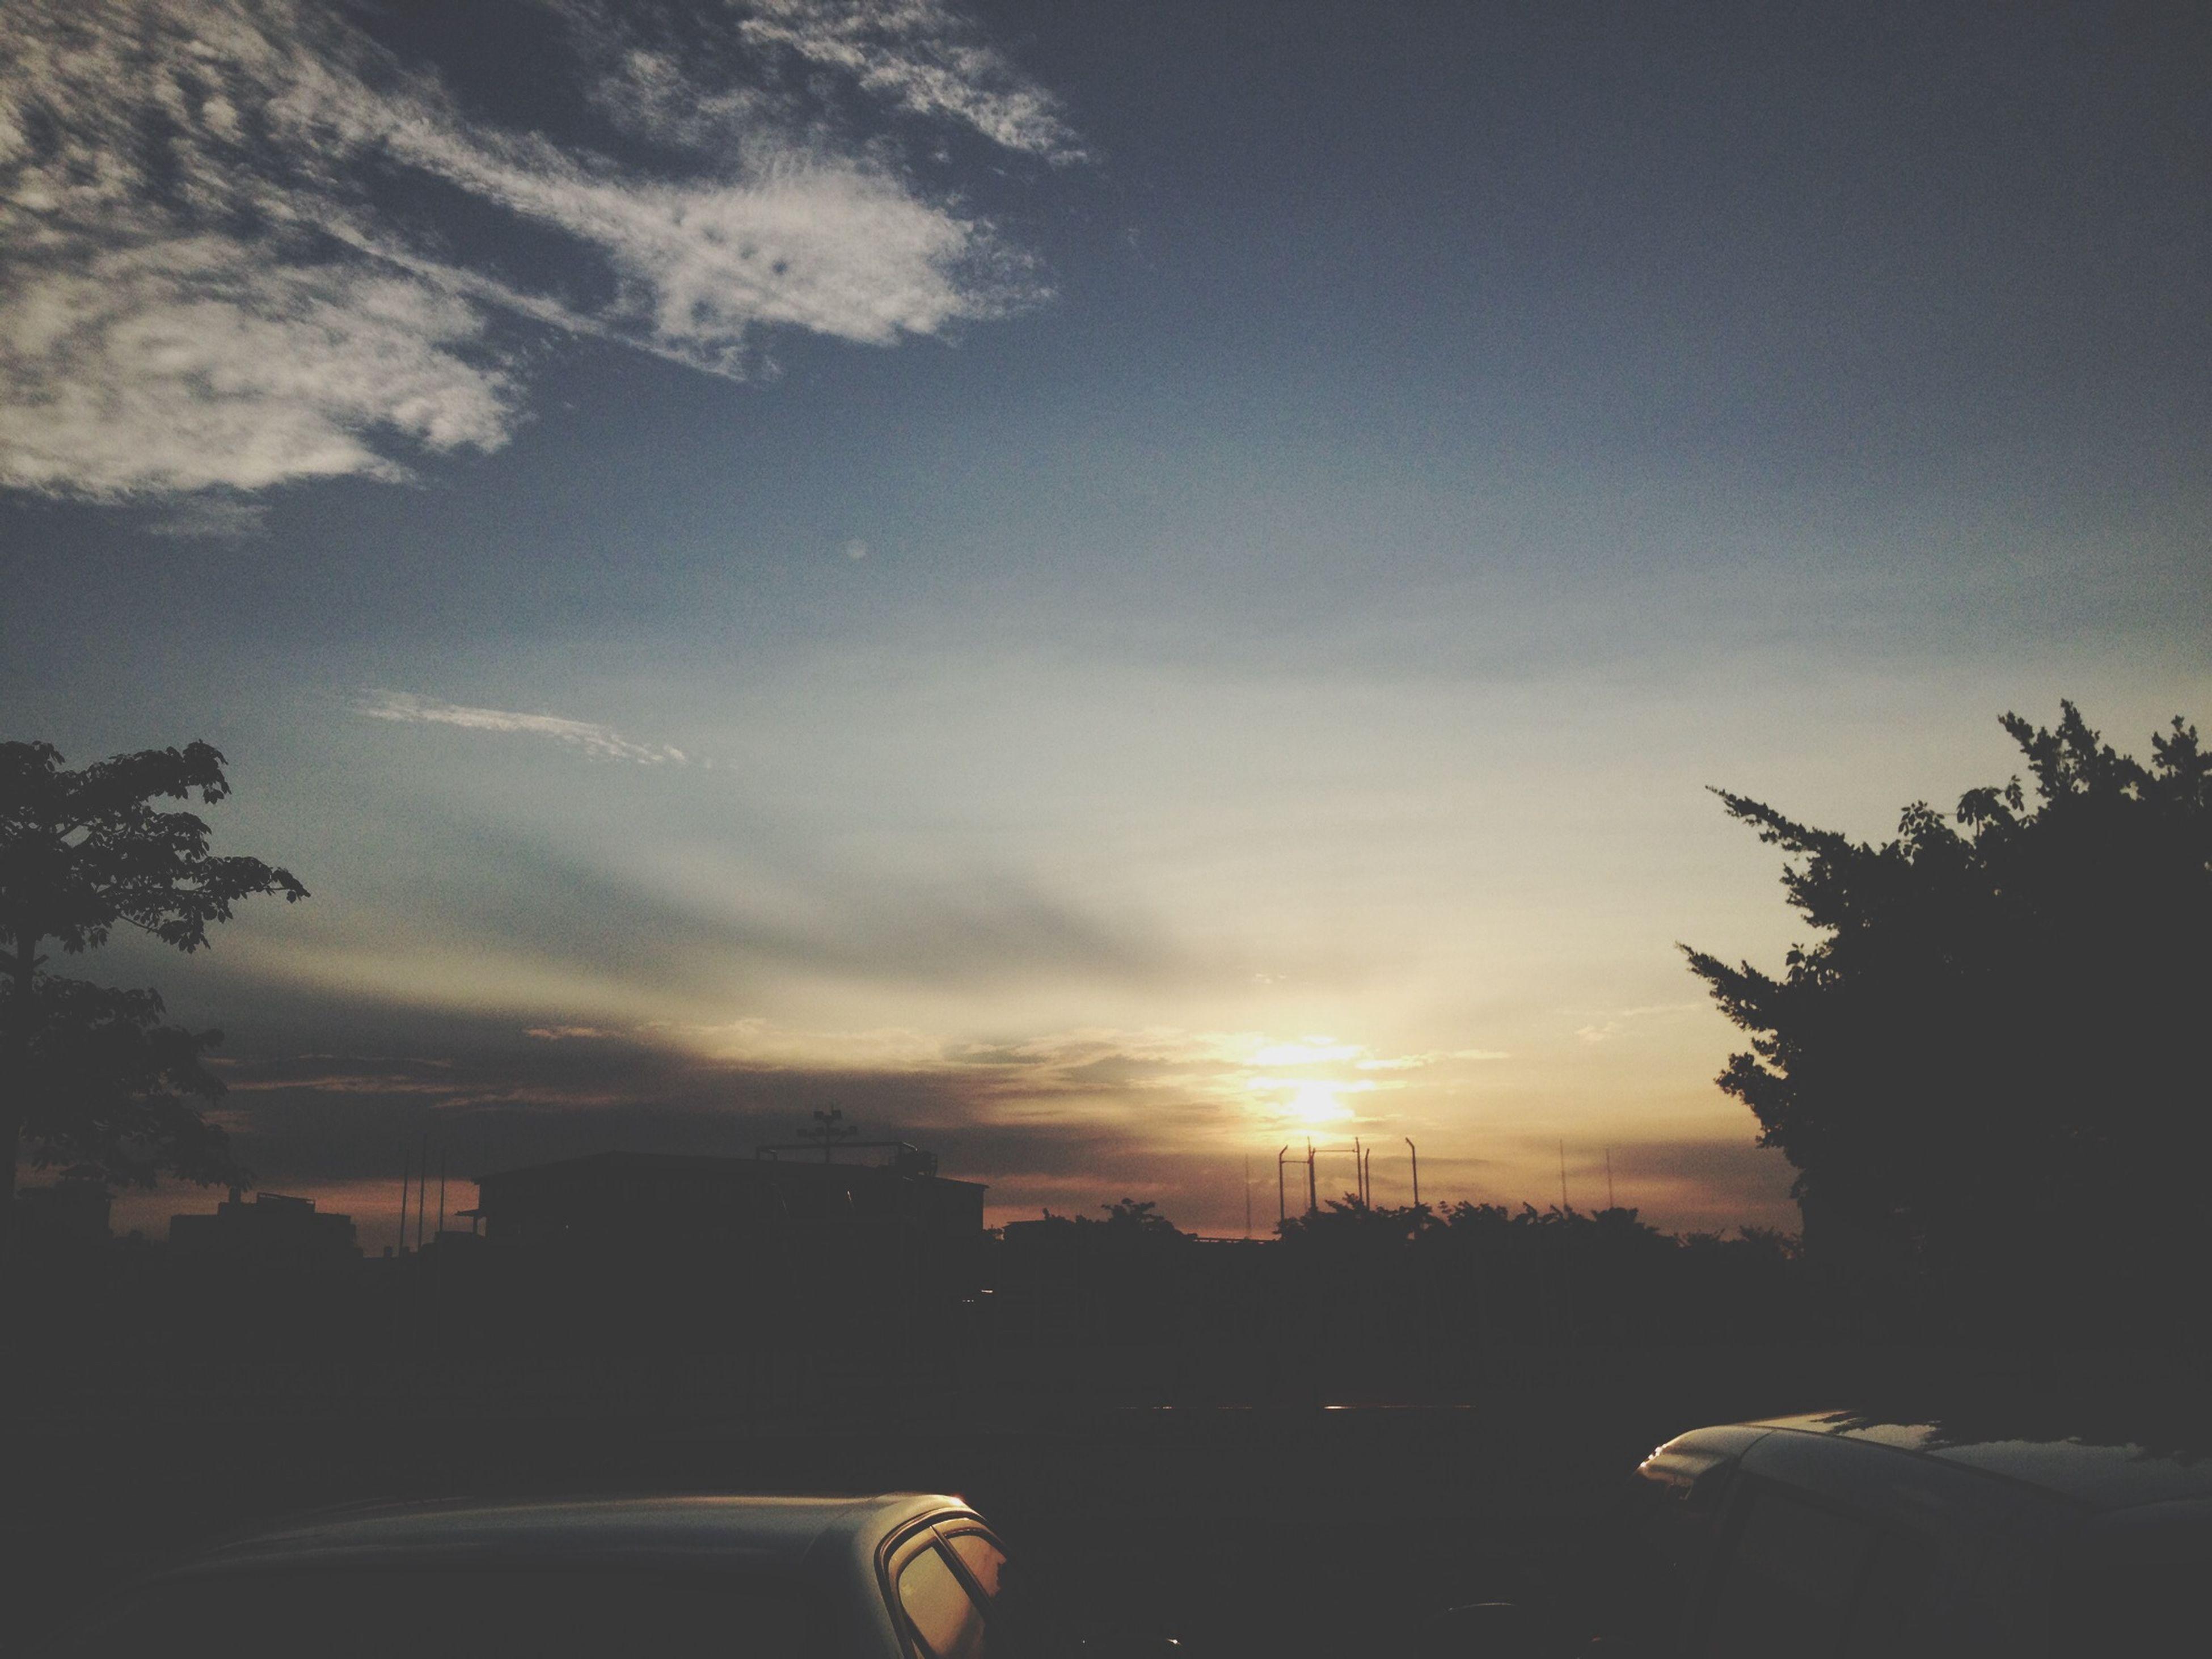 sunset, transportation, car, sky, silhouette, land vehicle, mode of transport, road, tree, sun, cloud - sky, scenics, beauty in nature, cloud, nature, tranquil scene, sunlight, orange color, tranquility, street